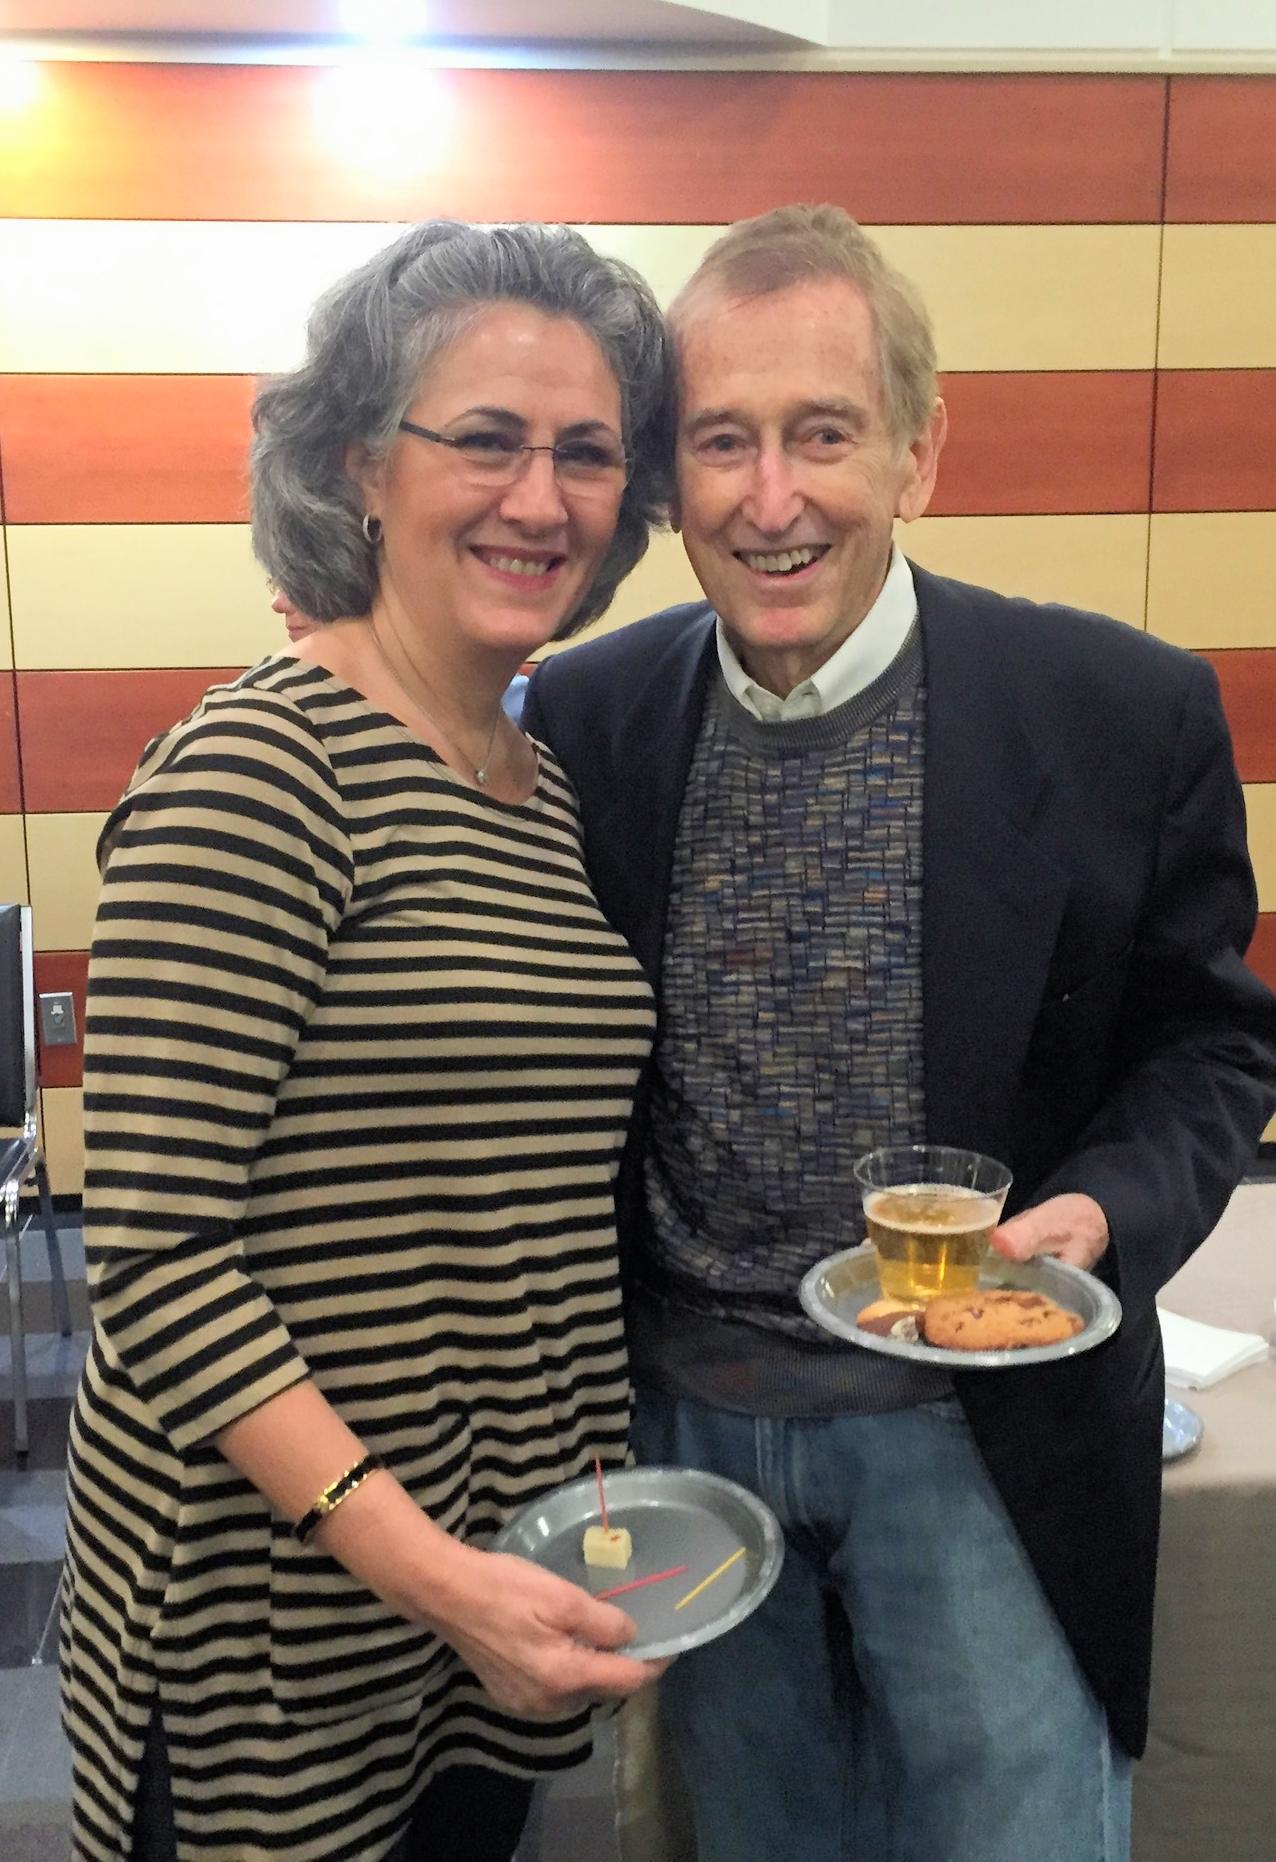 FLCC Director Robin Schamach with Advisory Board member Bob McGrath